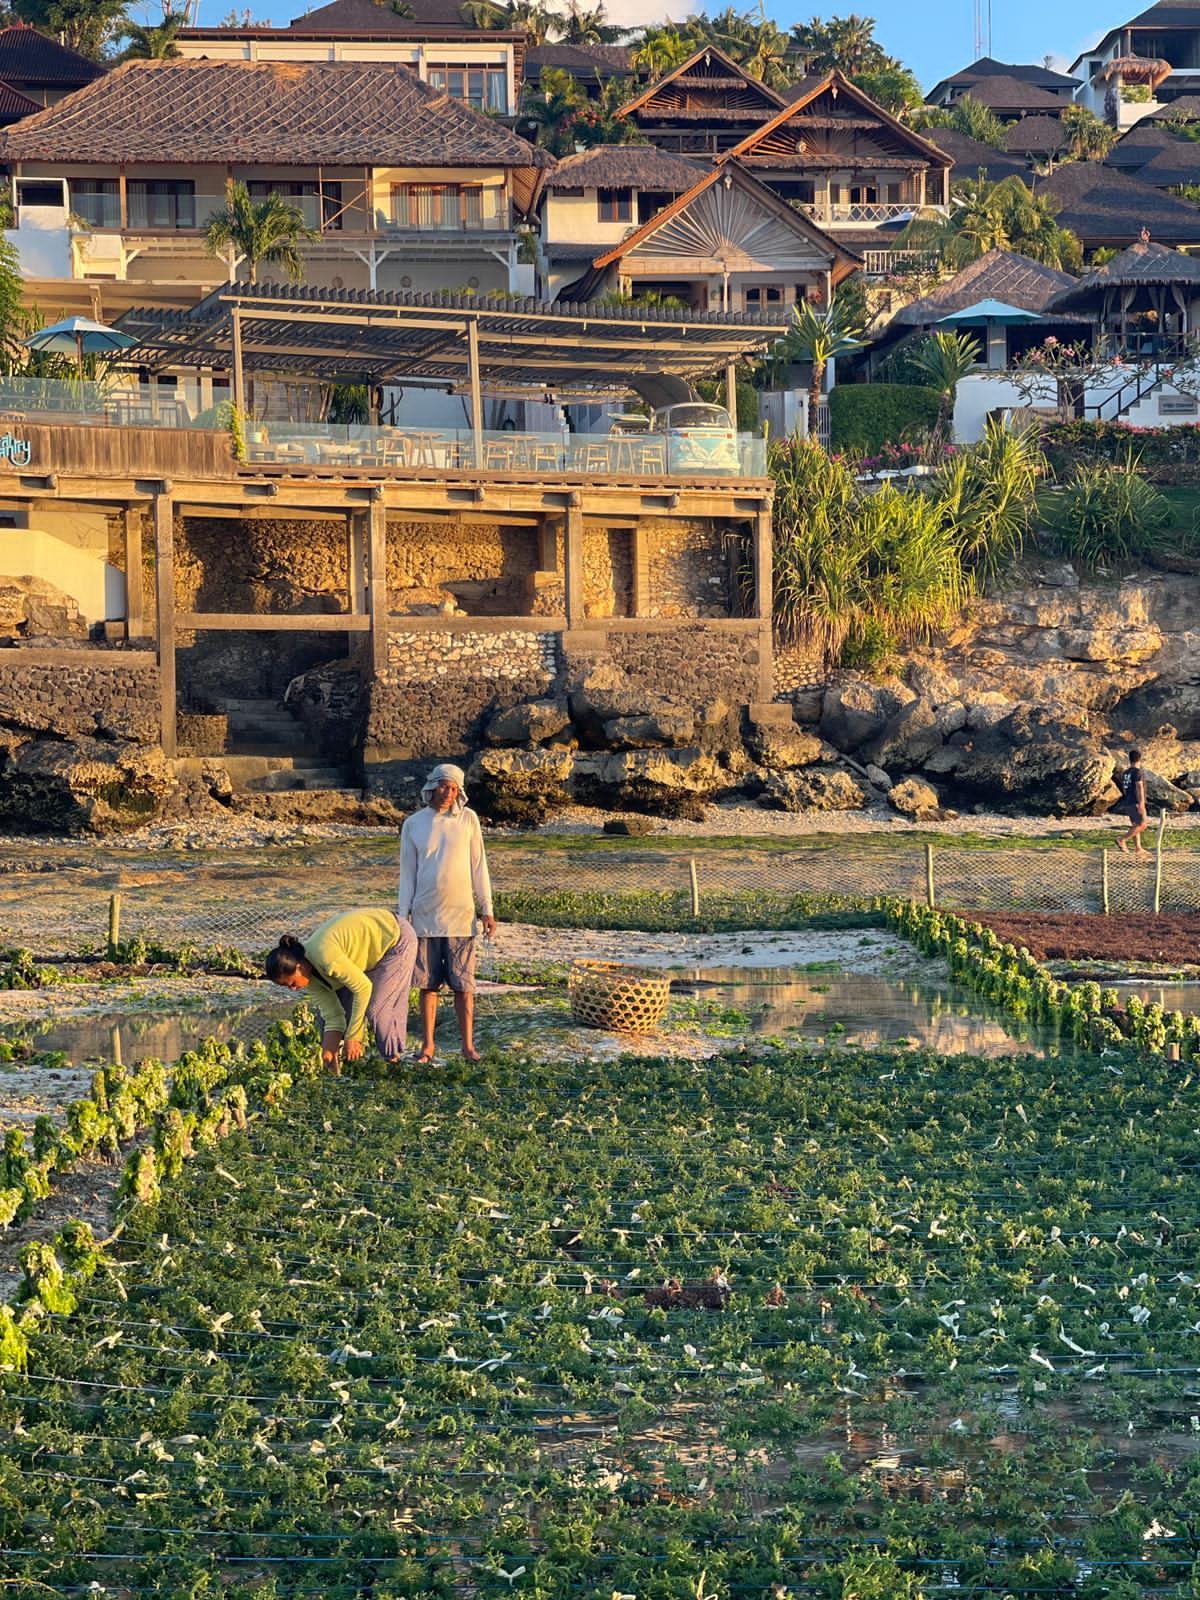 Lembongan Seaweed Farming, Lembongan Hotels, Lembongan Resorts, Lembongan Bungalows, Lembongan Villas, The Lembongan Traveller, Nusa Lembongan Hotels, Nusa Lembongan Resorts, Nusa Lembongan Bungalows, Nusa Lembongan Villas,